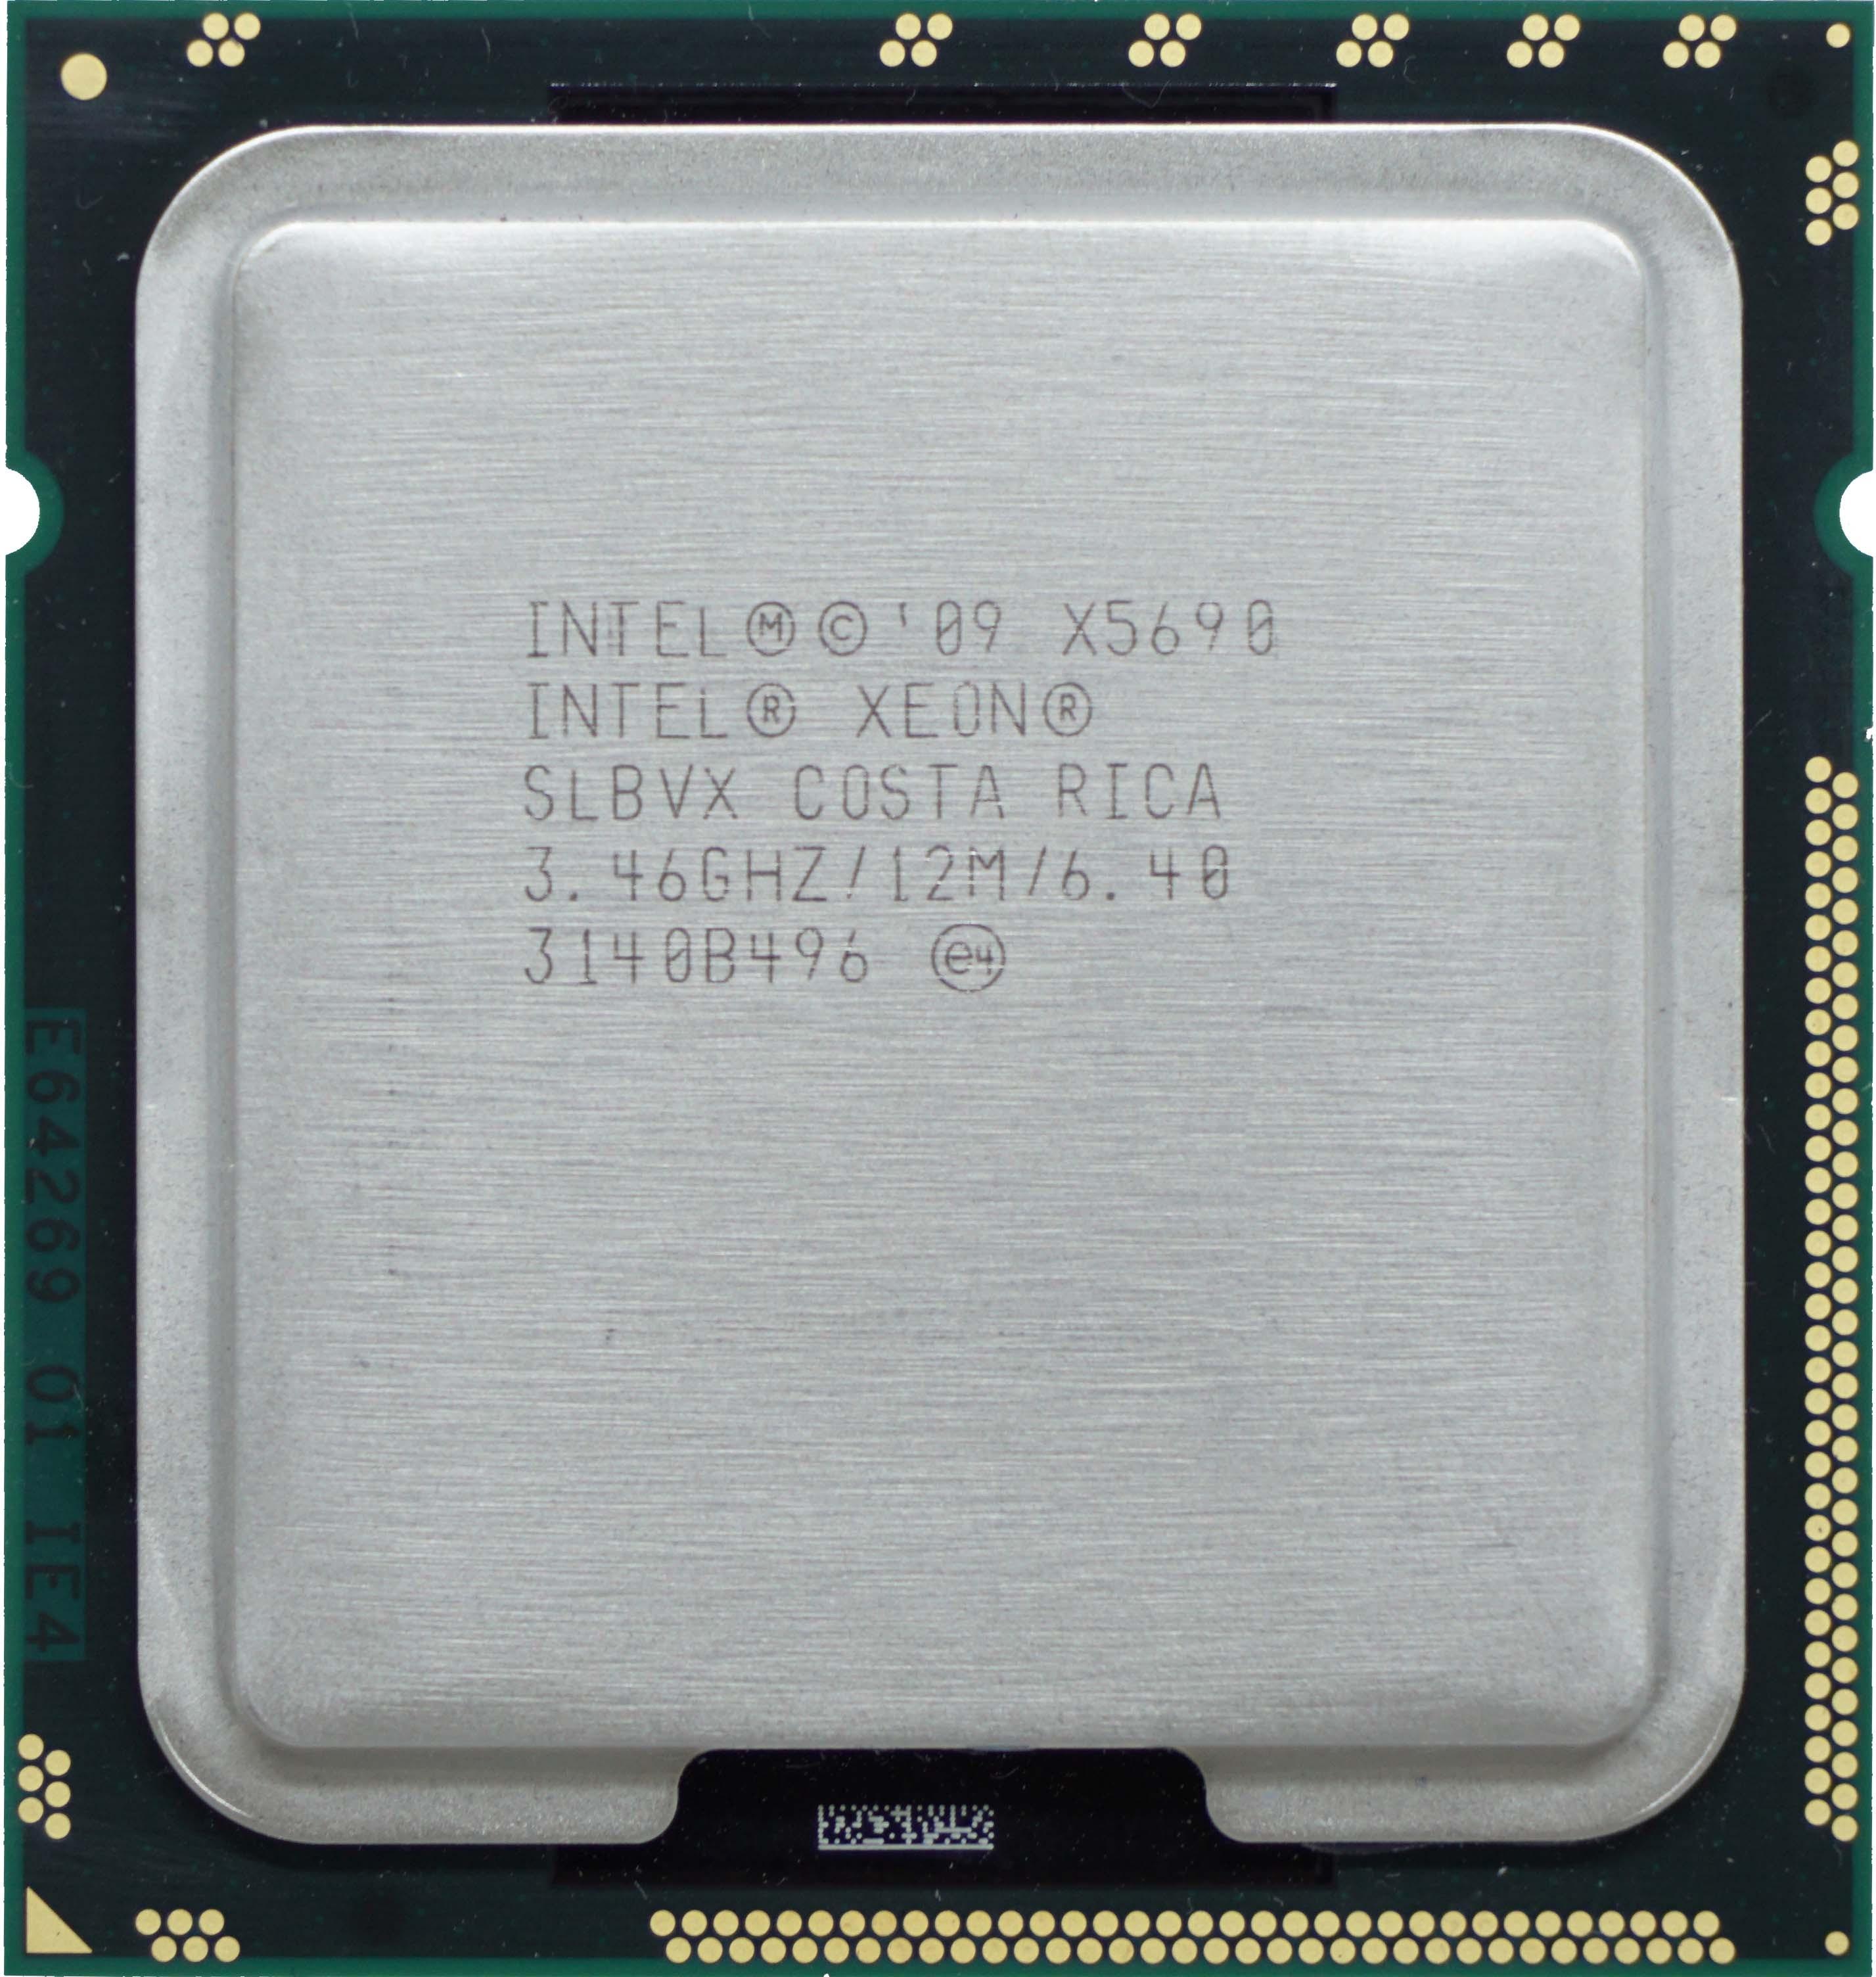 Intel Xeon X5690 (SLBVX) 3 46Ghz Hexa (6) Core LGA1366 130W CPU